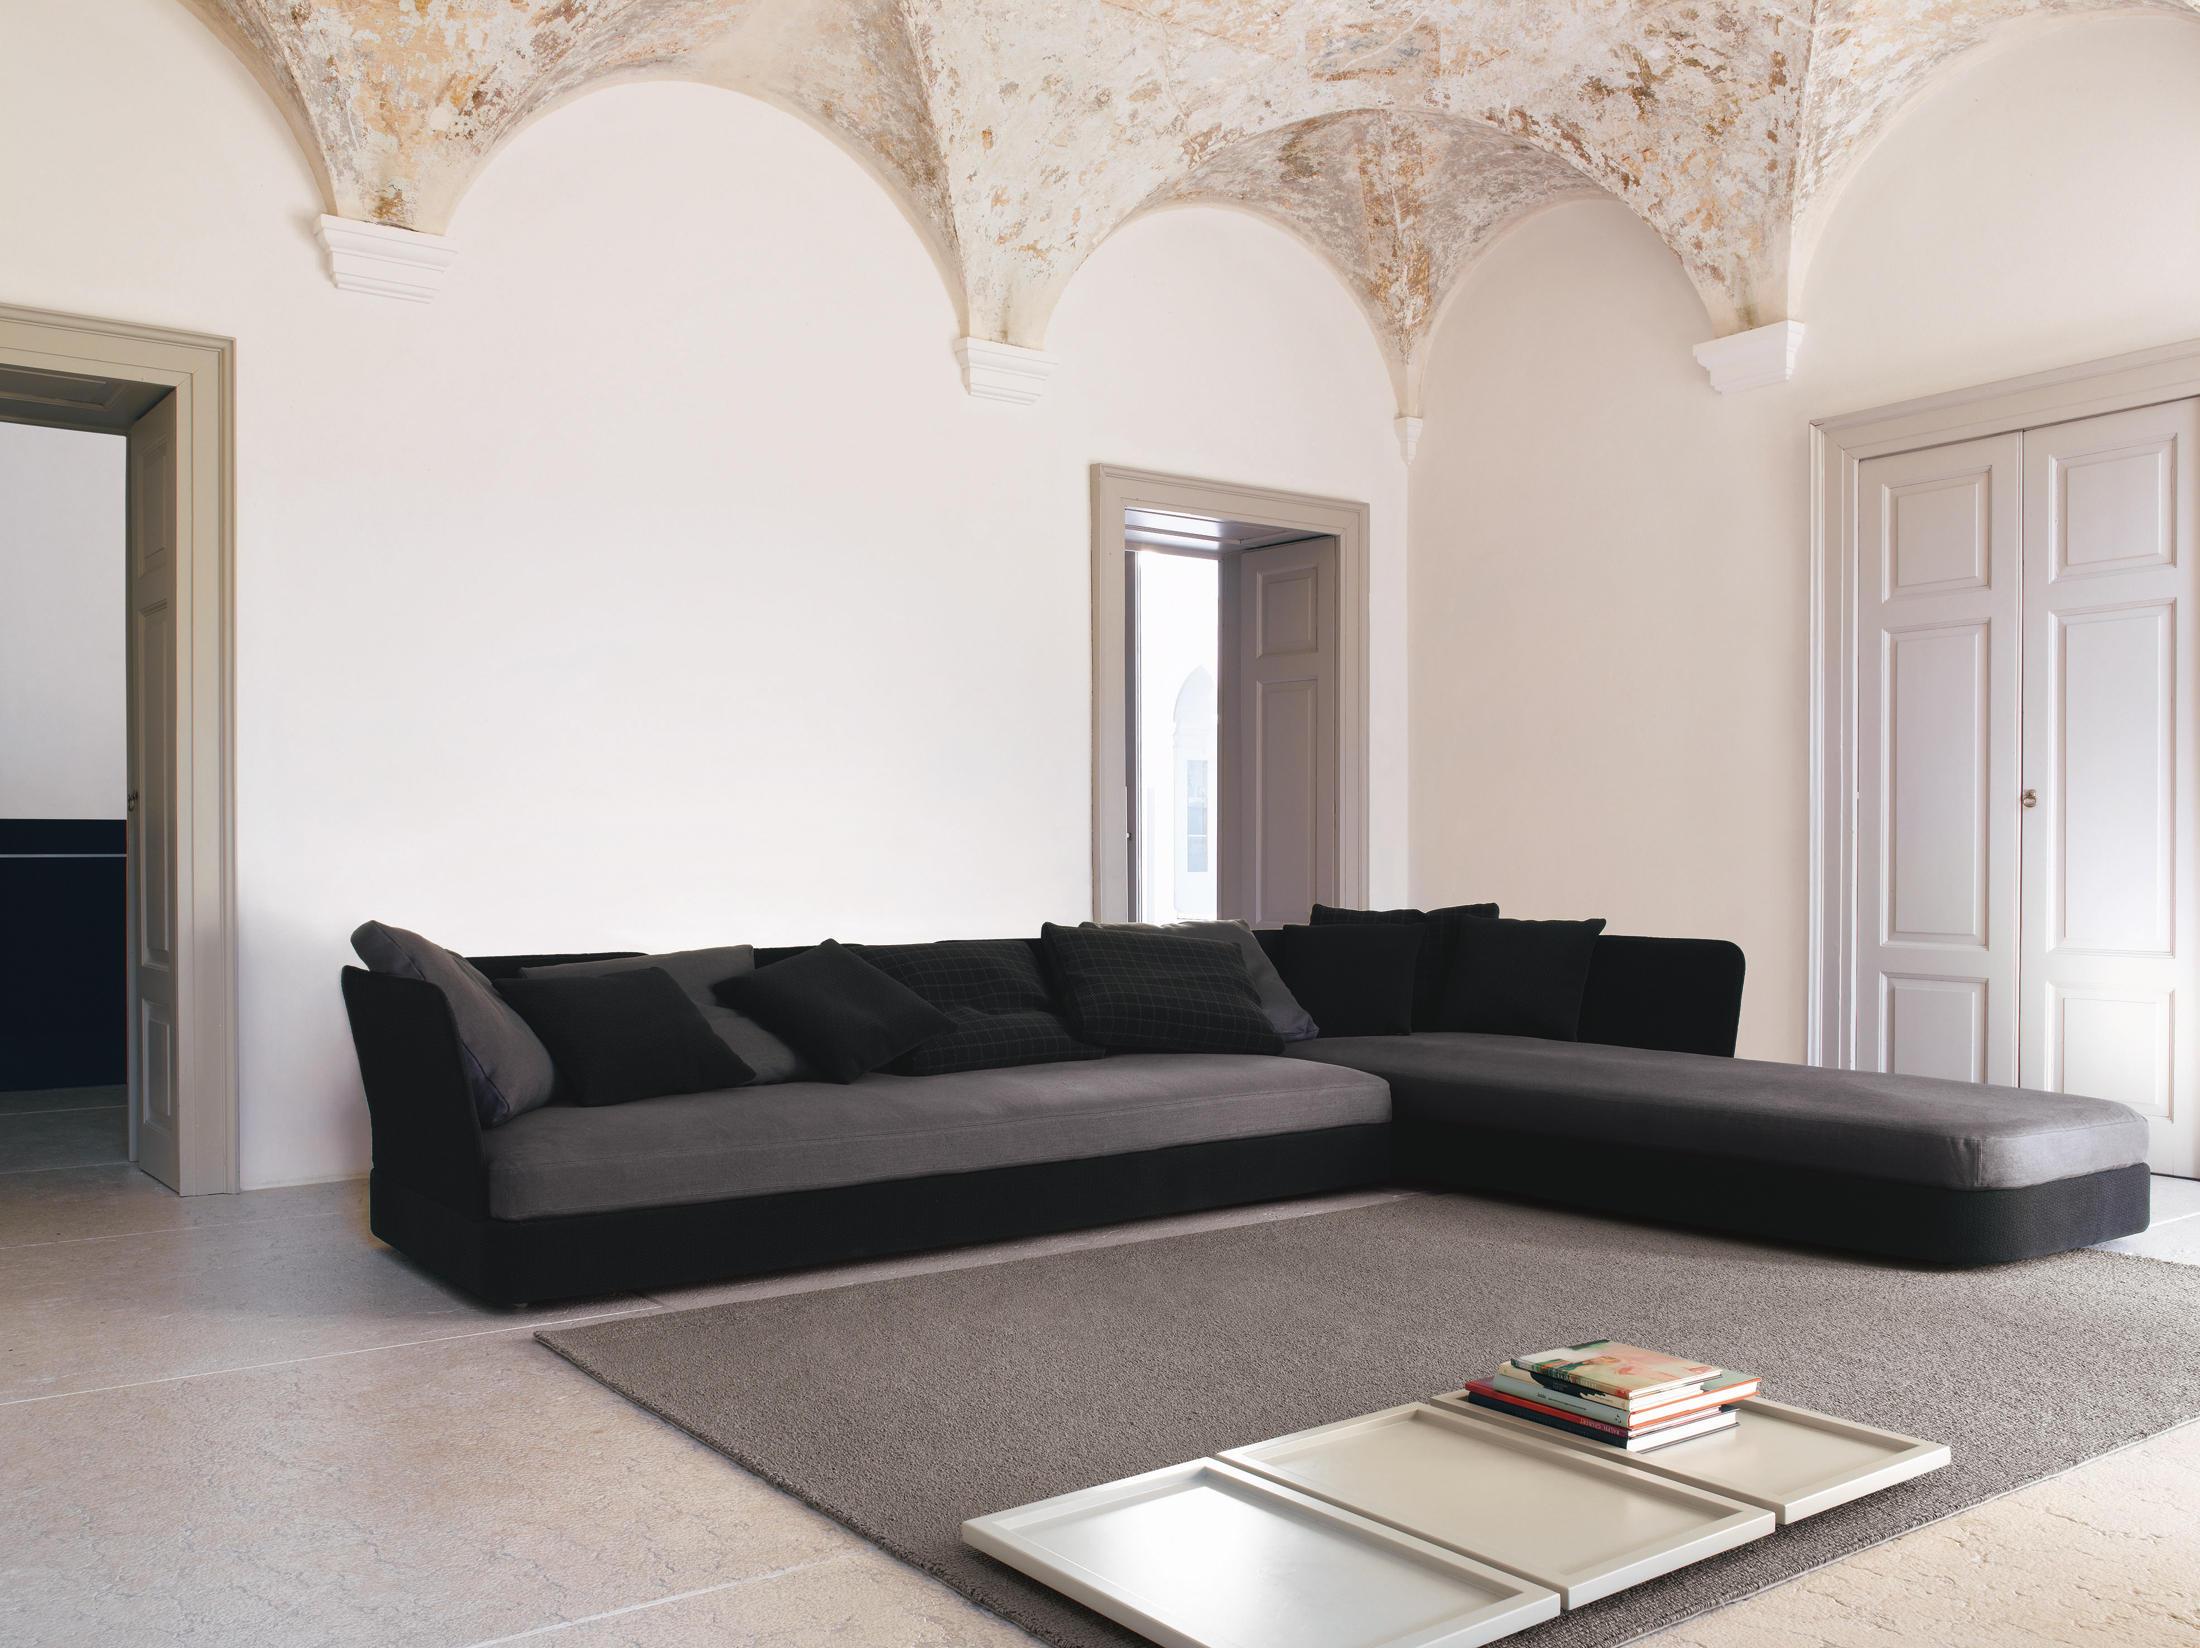 COVE - Sofas von Paola Lenti | Architonic